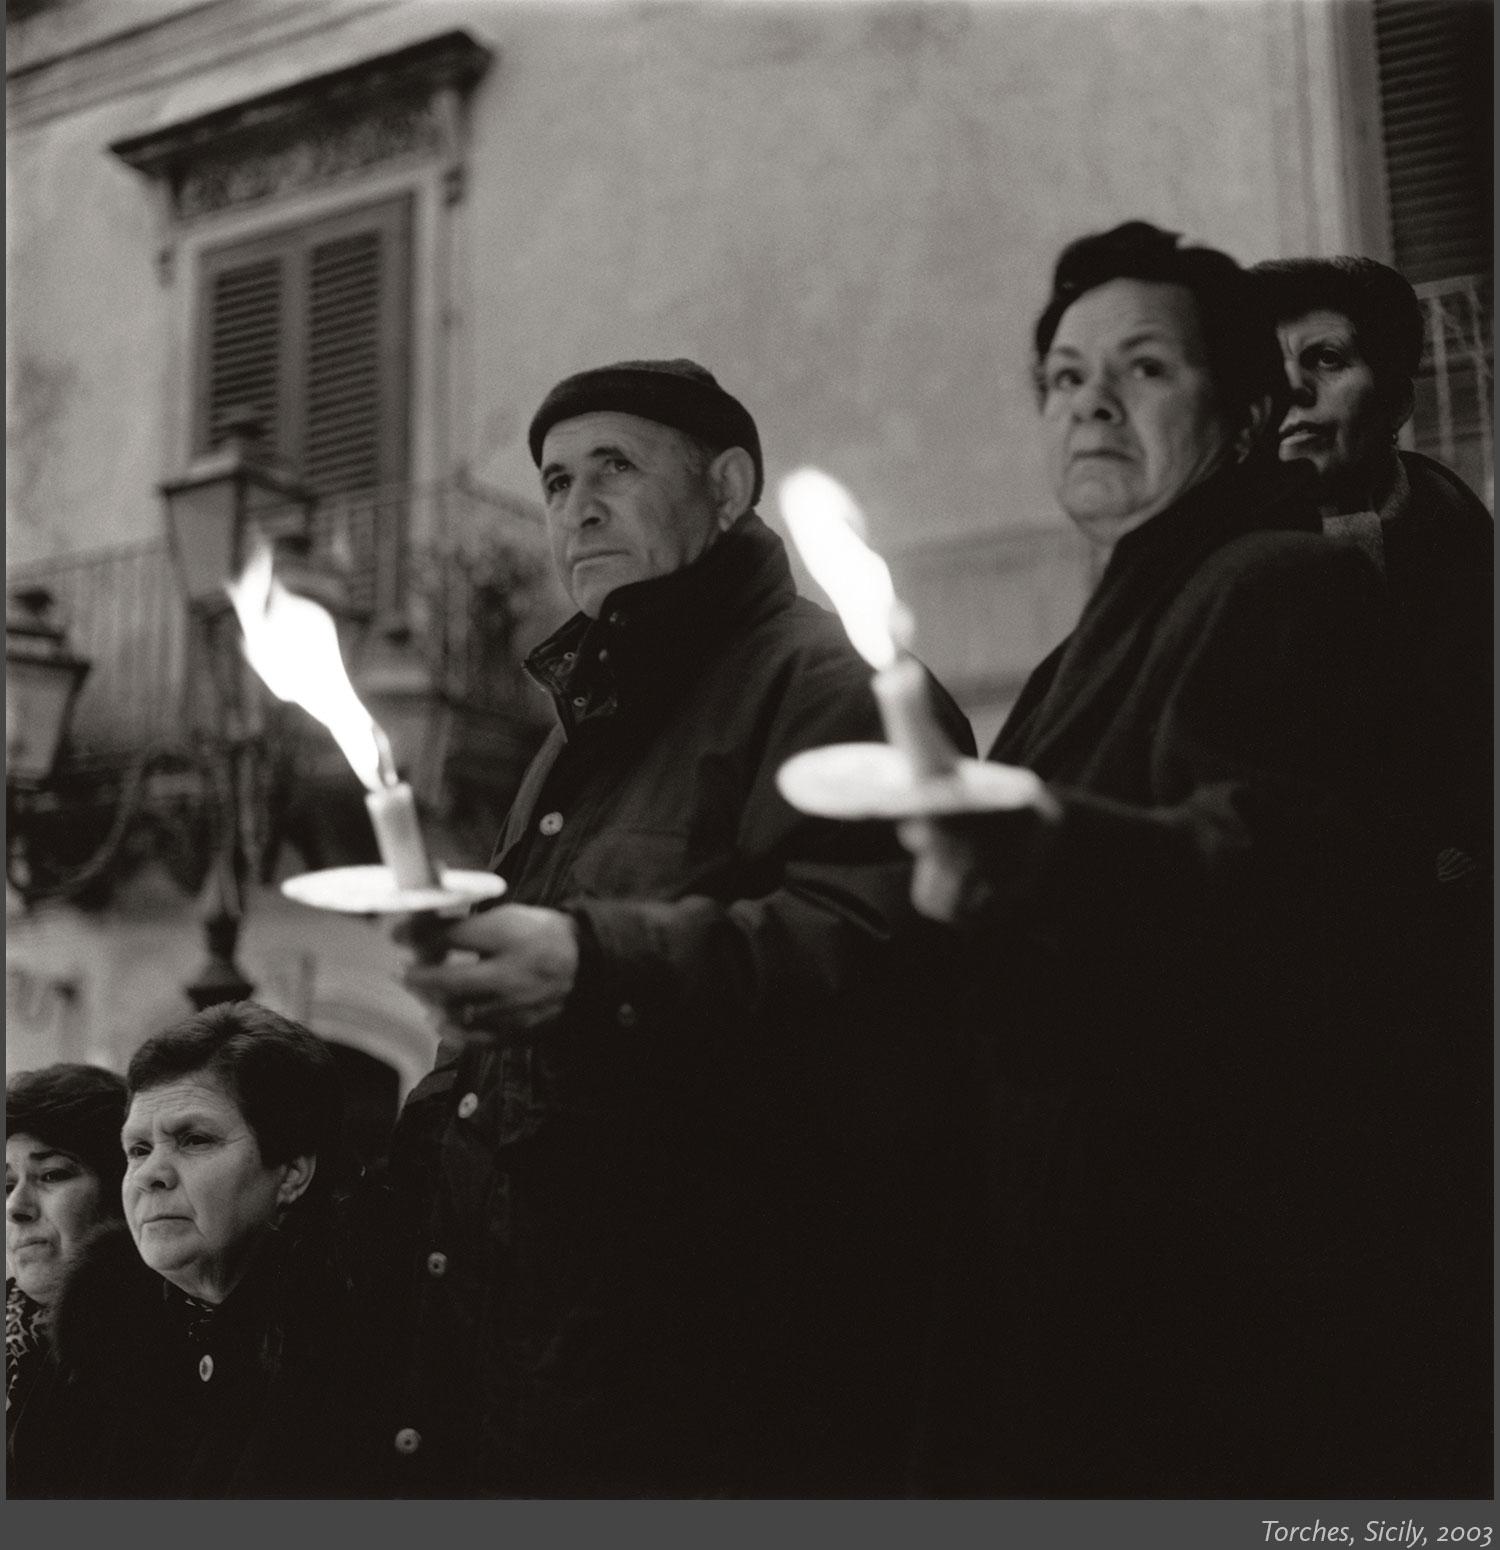 1_Torches,-Sicily,-2003.jpg